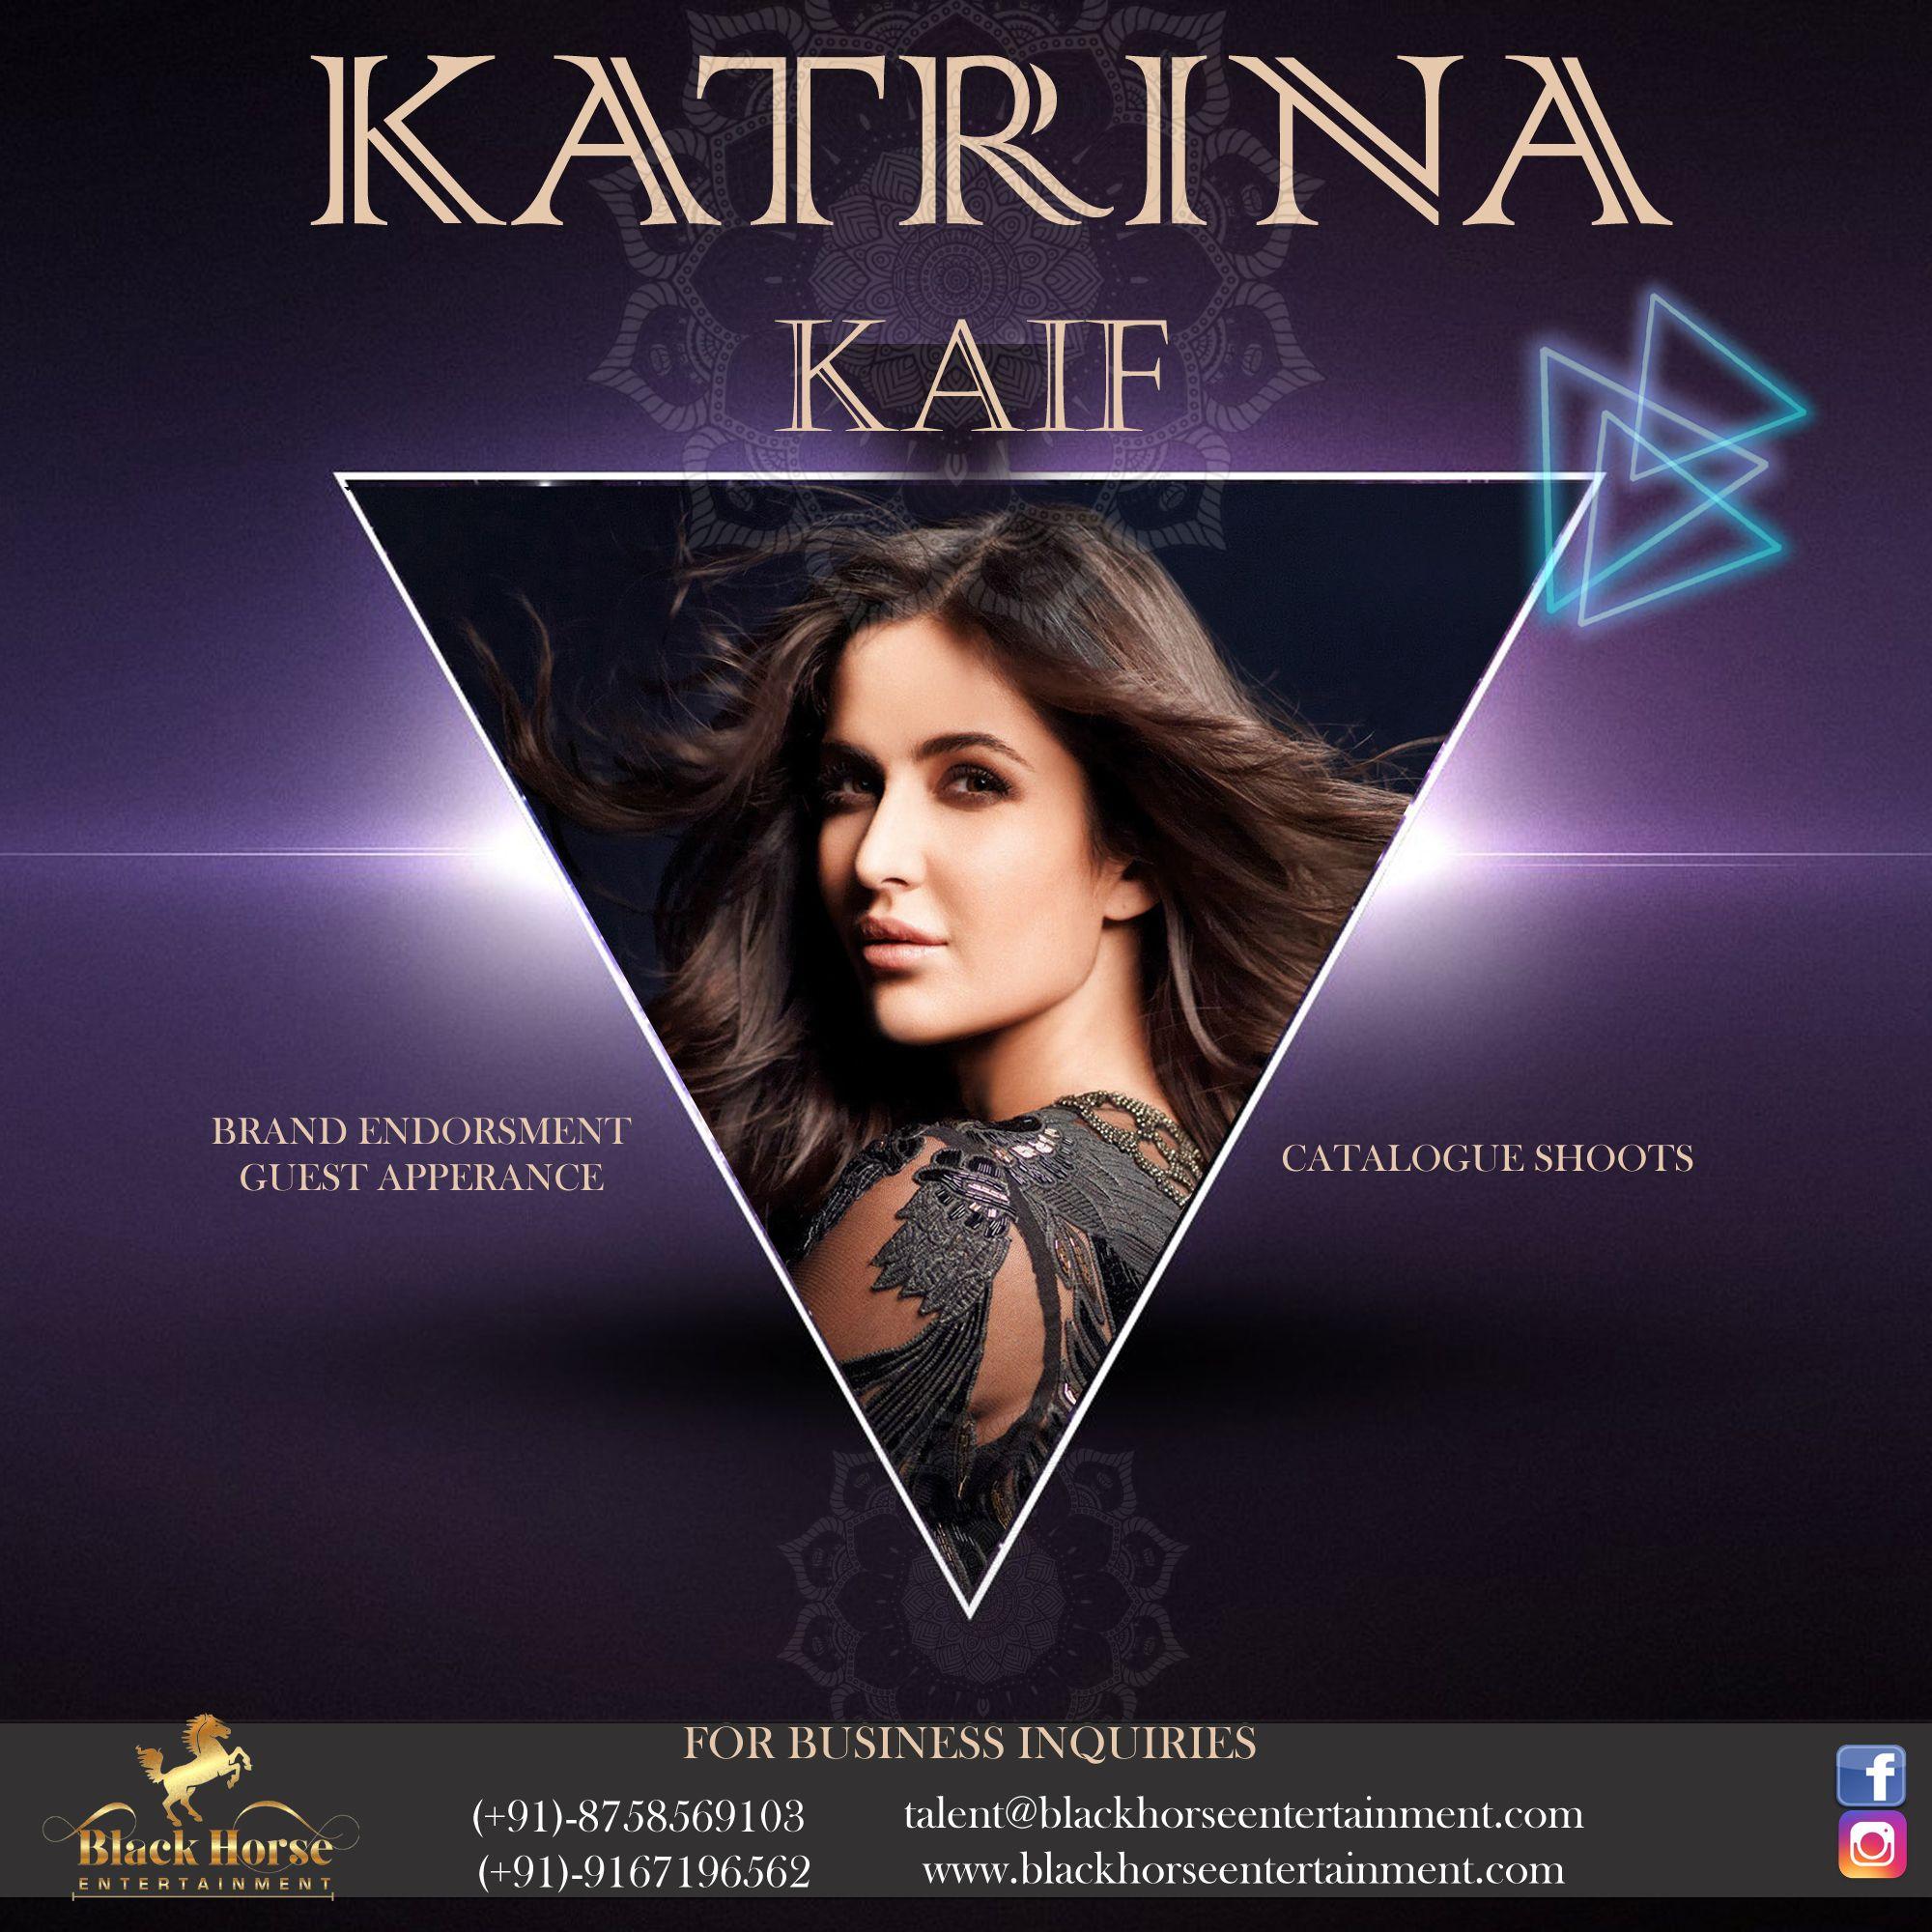 Katrina Kaif Contact Numbers Phone Number Whatsapp Number Celebrities Katrina Kaif Talent